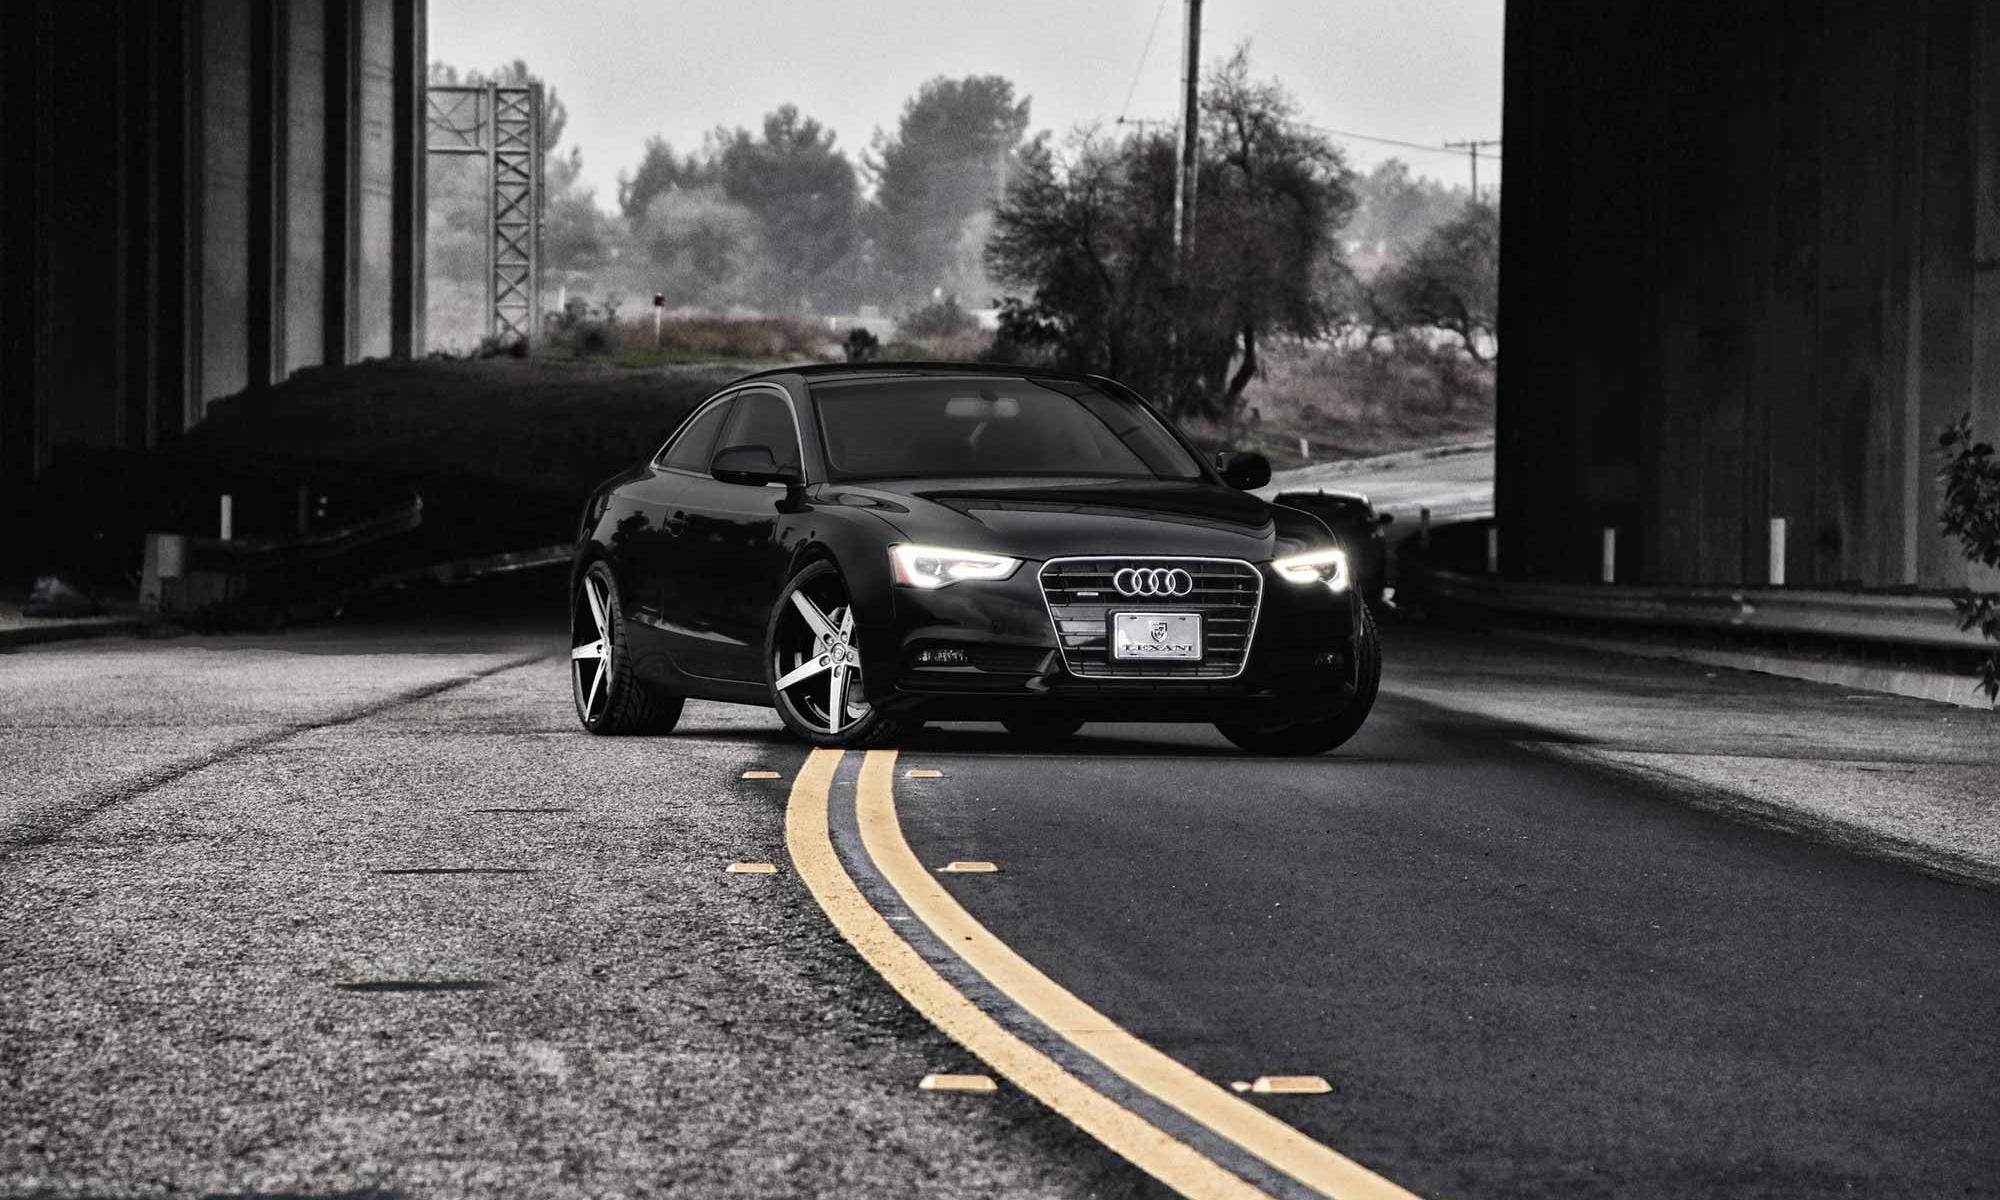 Hd Car Wallpapers 1920x1080 Free Download Audi A5 Hd Wallpaper Pixelstalk Net